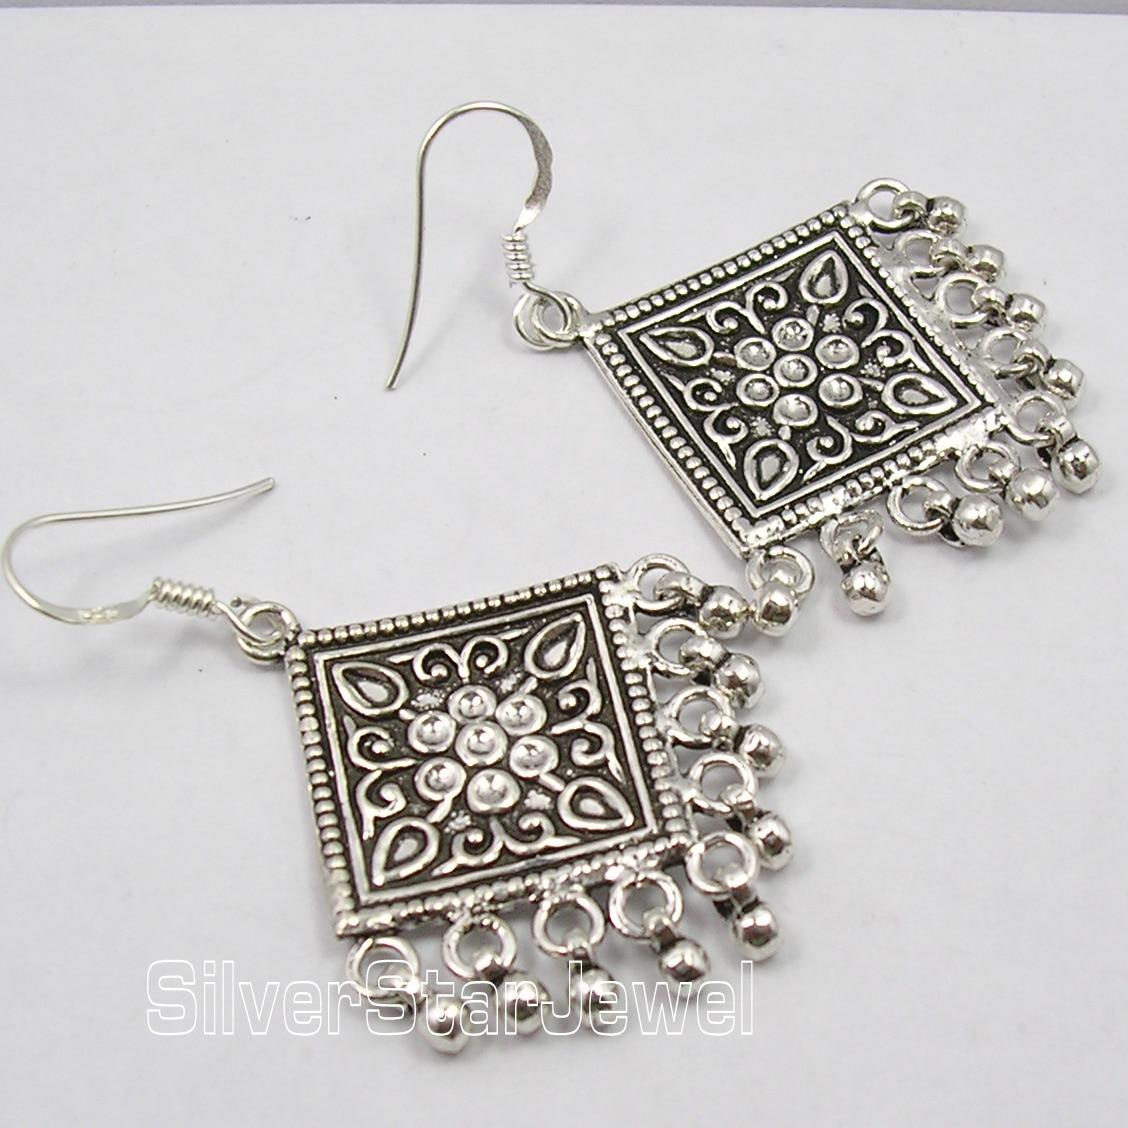 Chanti International PURE Silver UNUSUAL TRIBAL INDIA Earrings 5.2 CM 13.6 Grams OXIDIZED JEWELRY dhanedhar manisha narwade sunil tribal malnutrition in india